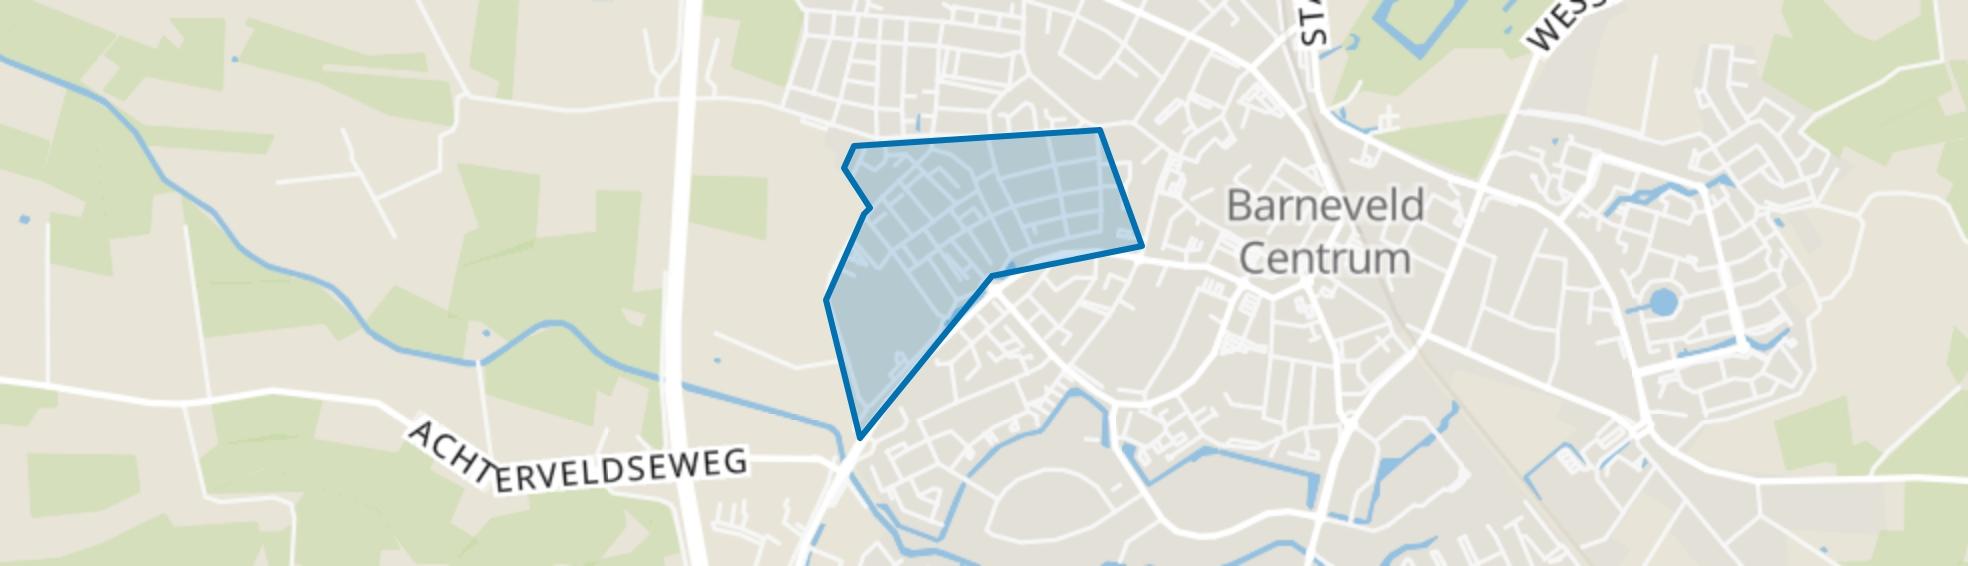 Oldenbarneveld, Barneveld map